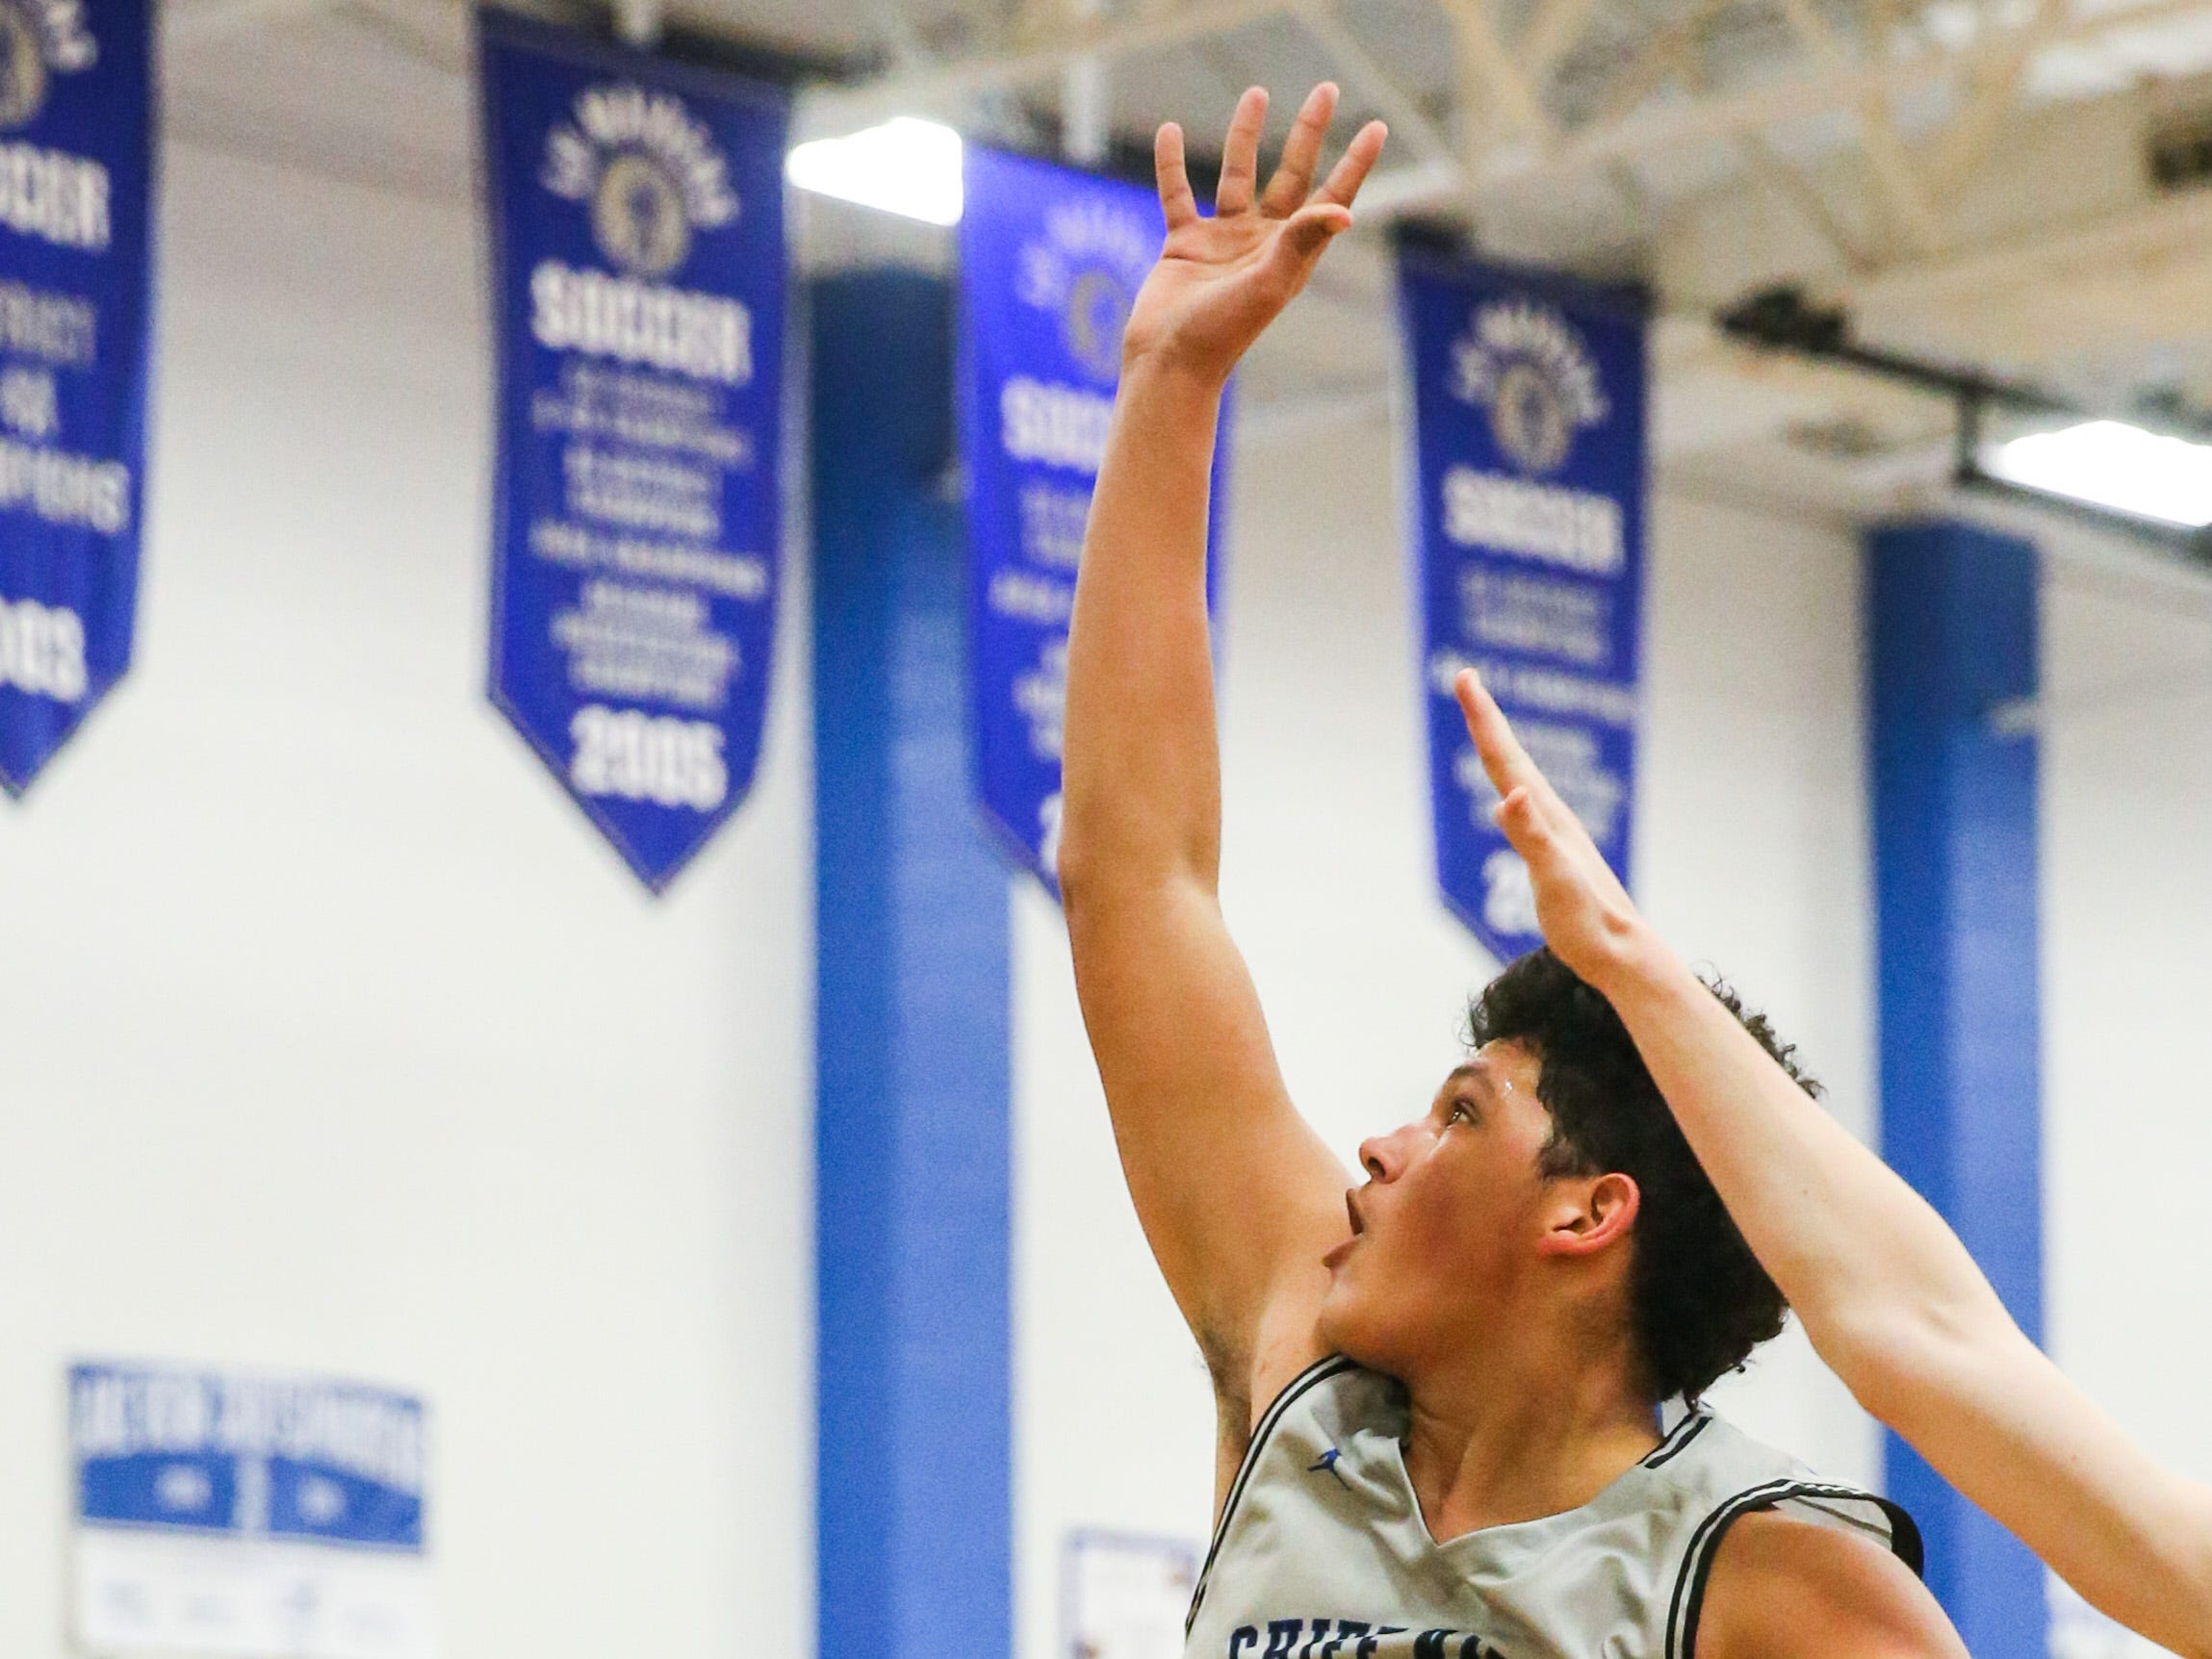 Lake View's Joseph Brooks jumps to shoot as Big Spring player blocks Friday, Jan. 25, 2019, at Lake View gym.